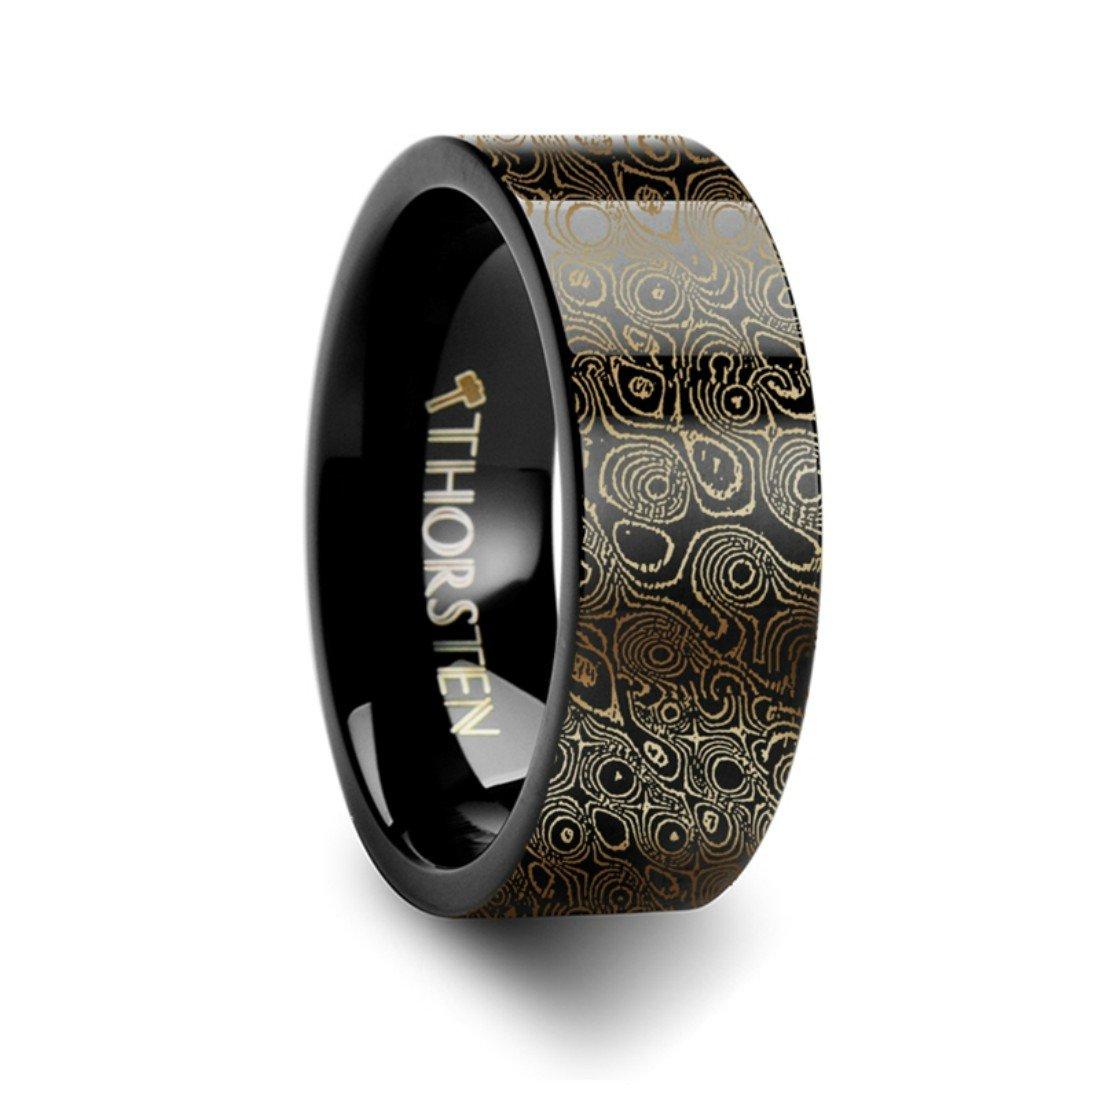 Thorsten Circular Damascus Steel Design Print Pattern Ring Flat Black Tungsten Ring 6mm Wide Wedding Band from Roy Rose Jewelry